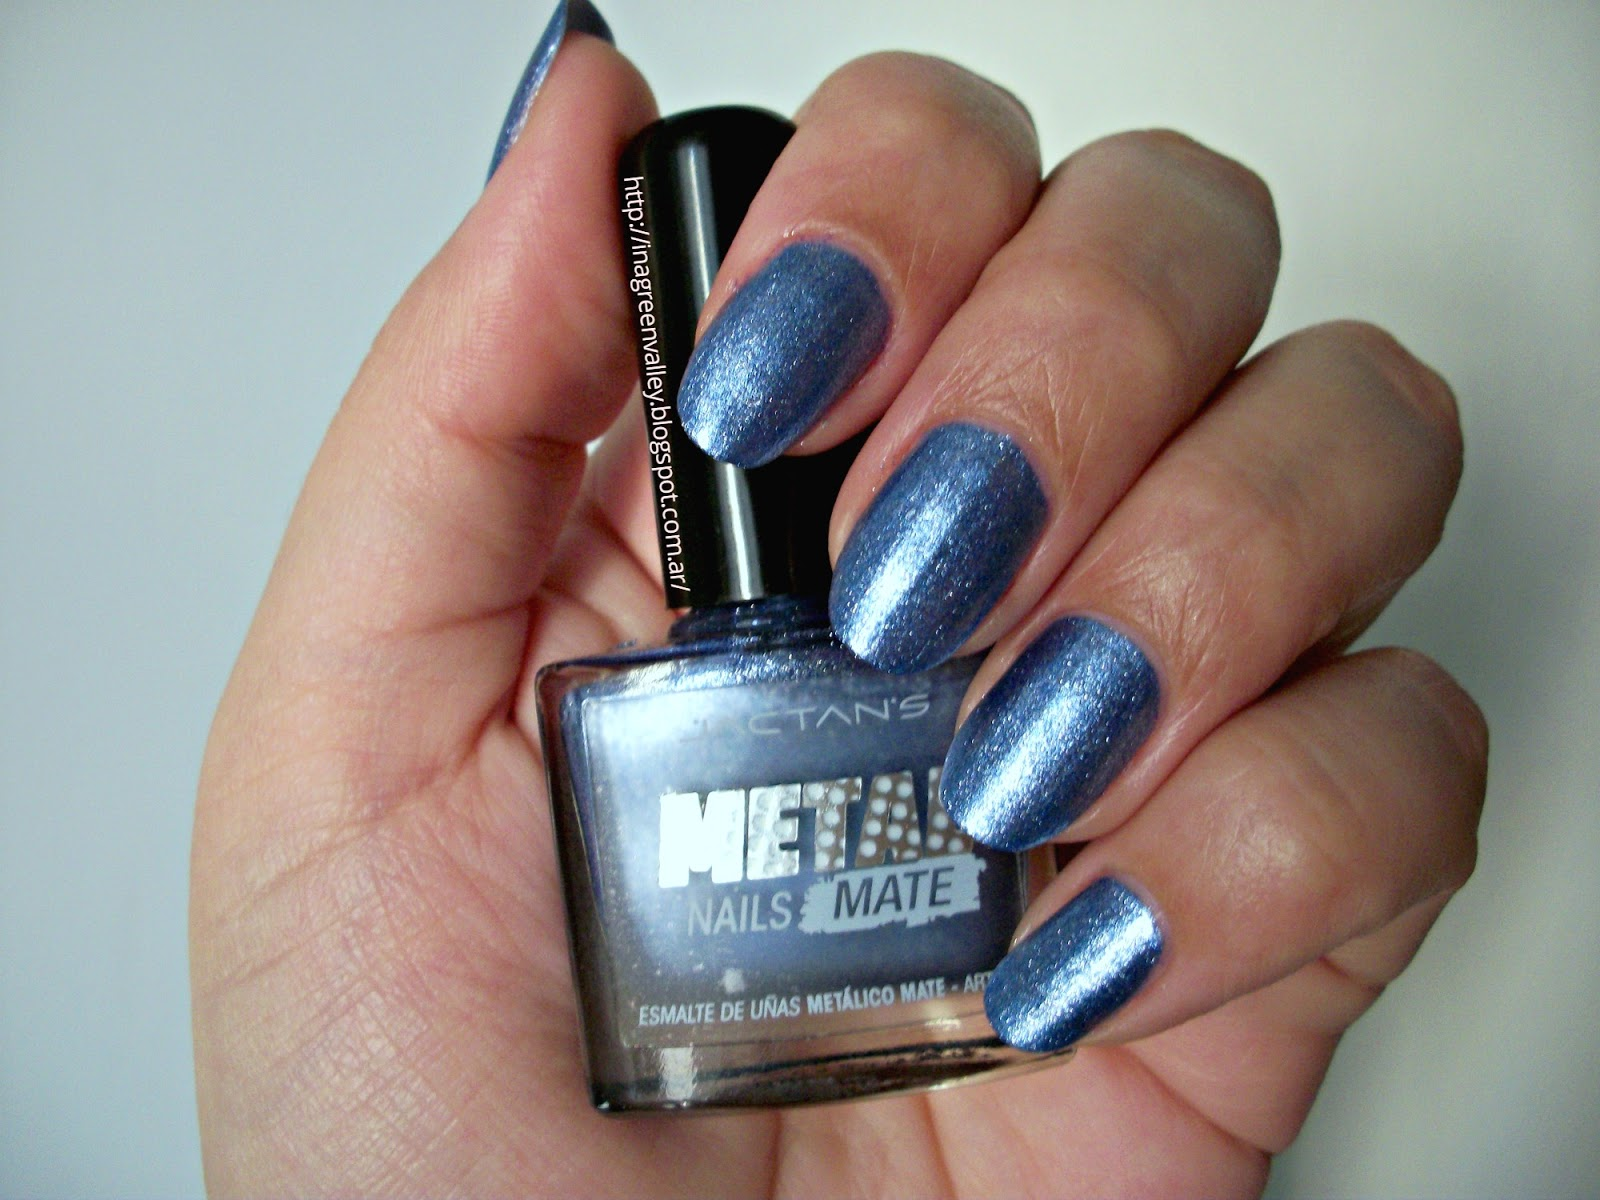 Grinvali: Reseña: Esmalte de uñas Metal Nails Mate - Jactans - 006 ...